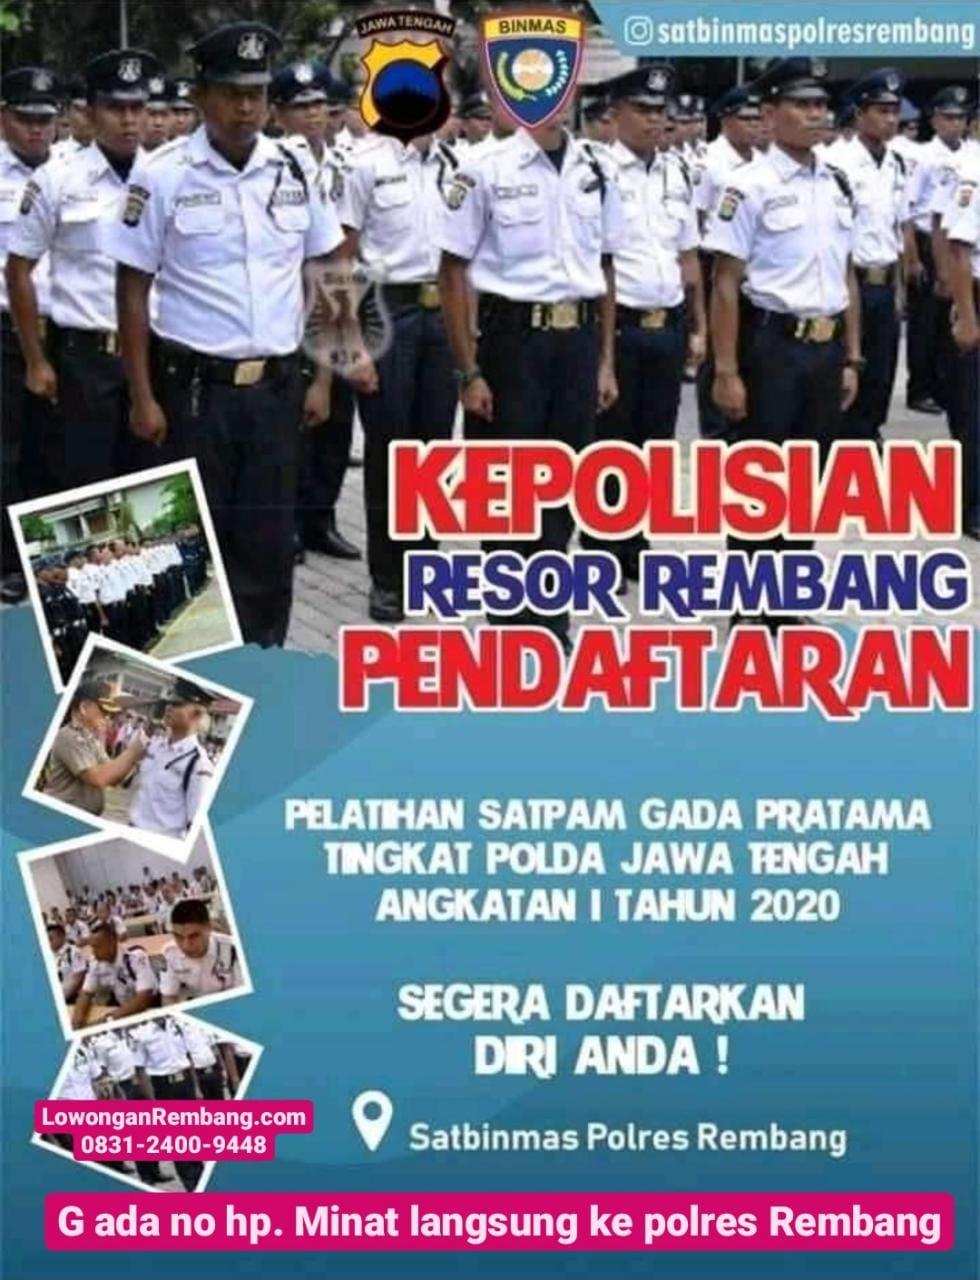 Pendaftaran Pelatihan Satpam Gada Pratama Satbinmas Polres Rembang